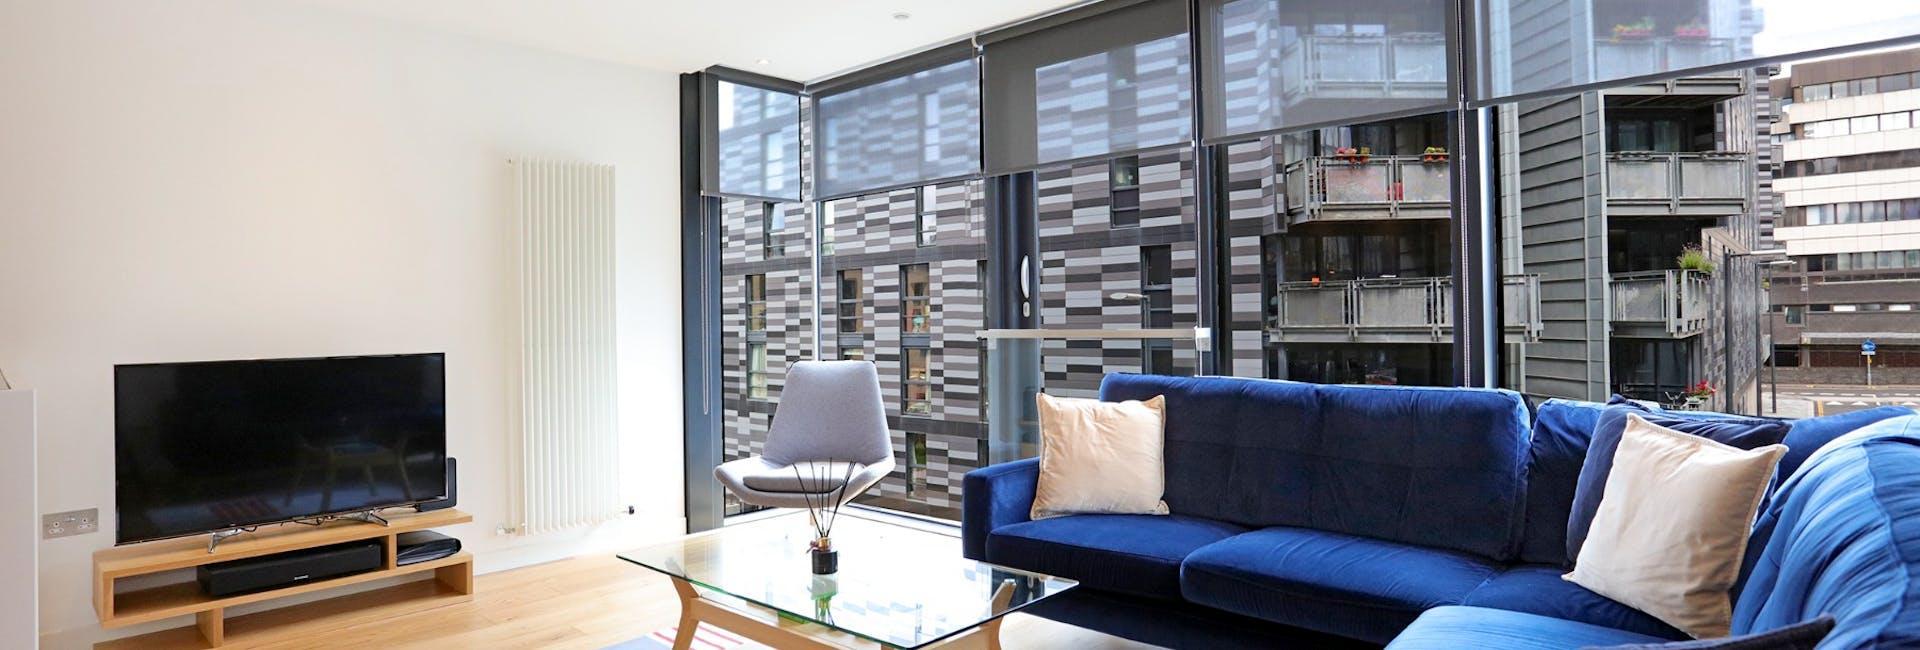 Featured Image for Simpson Loan P403 Lauriston and Bruntsfield Edinburgh